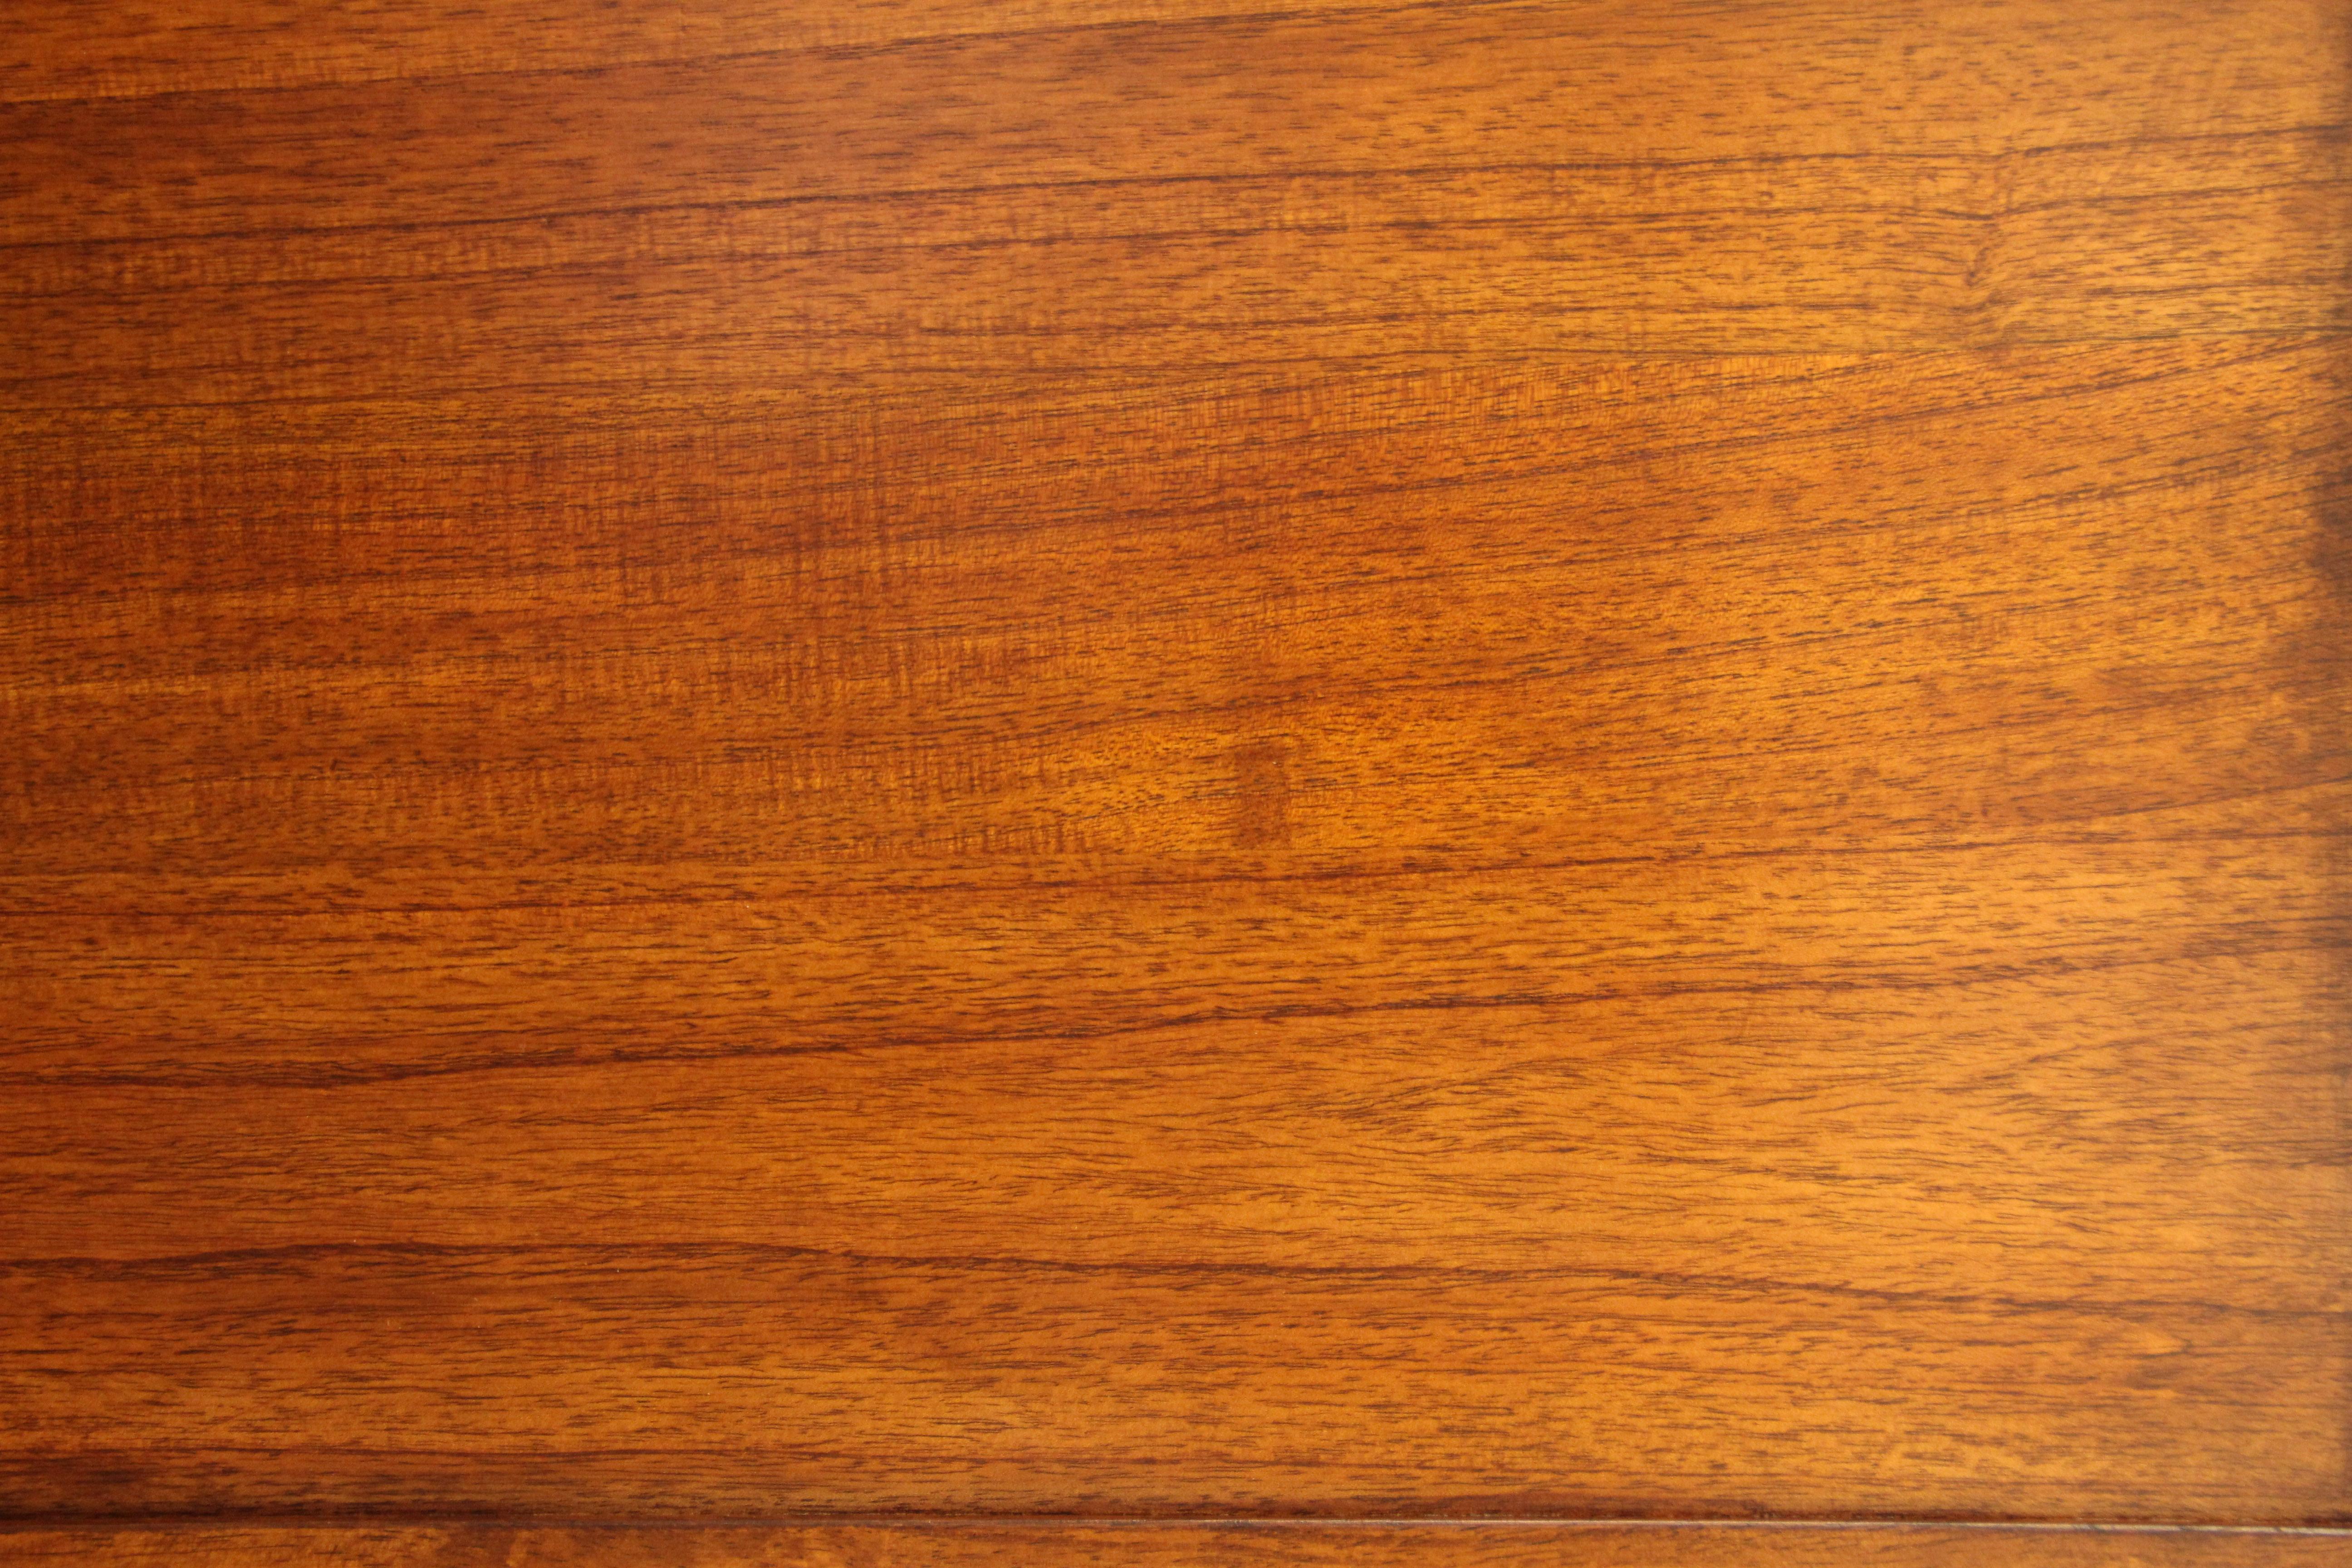 Wood Grain Texture Photoshop